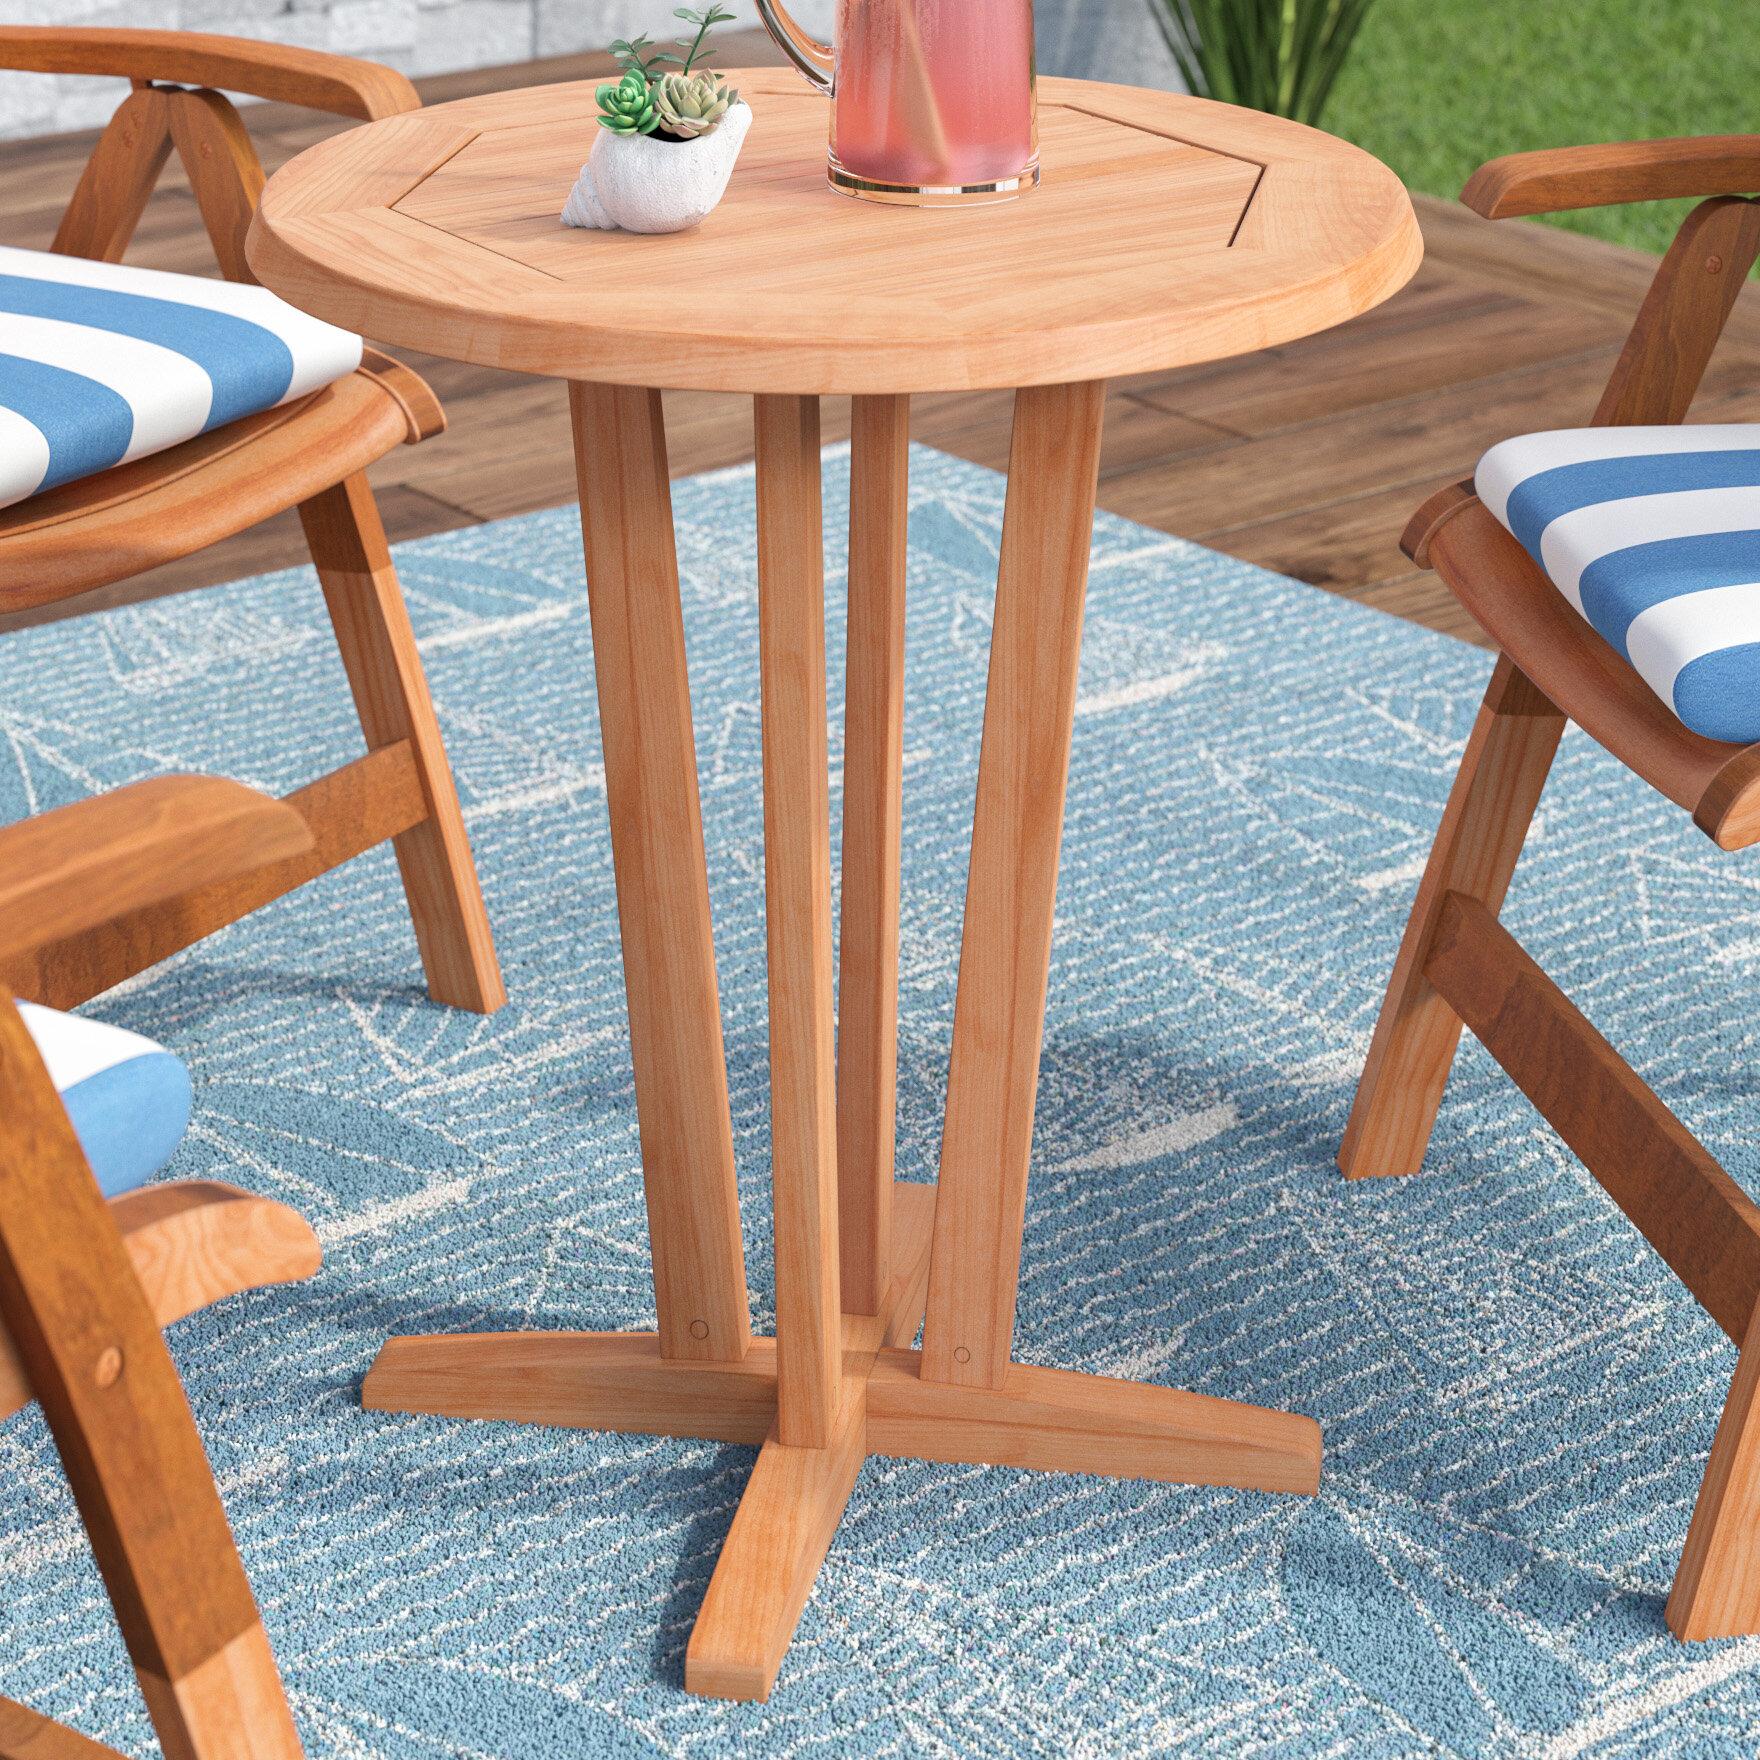 Surprising Elsmere Teak Dining Table Download Free Architecture Designs Grimeyleaguecom